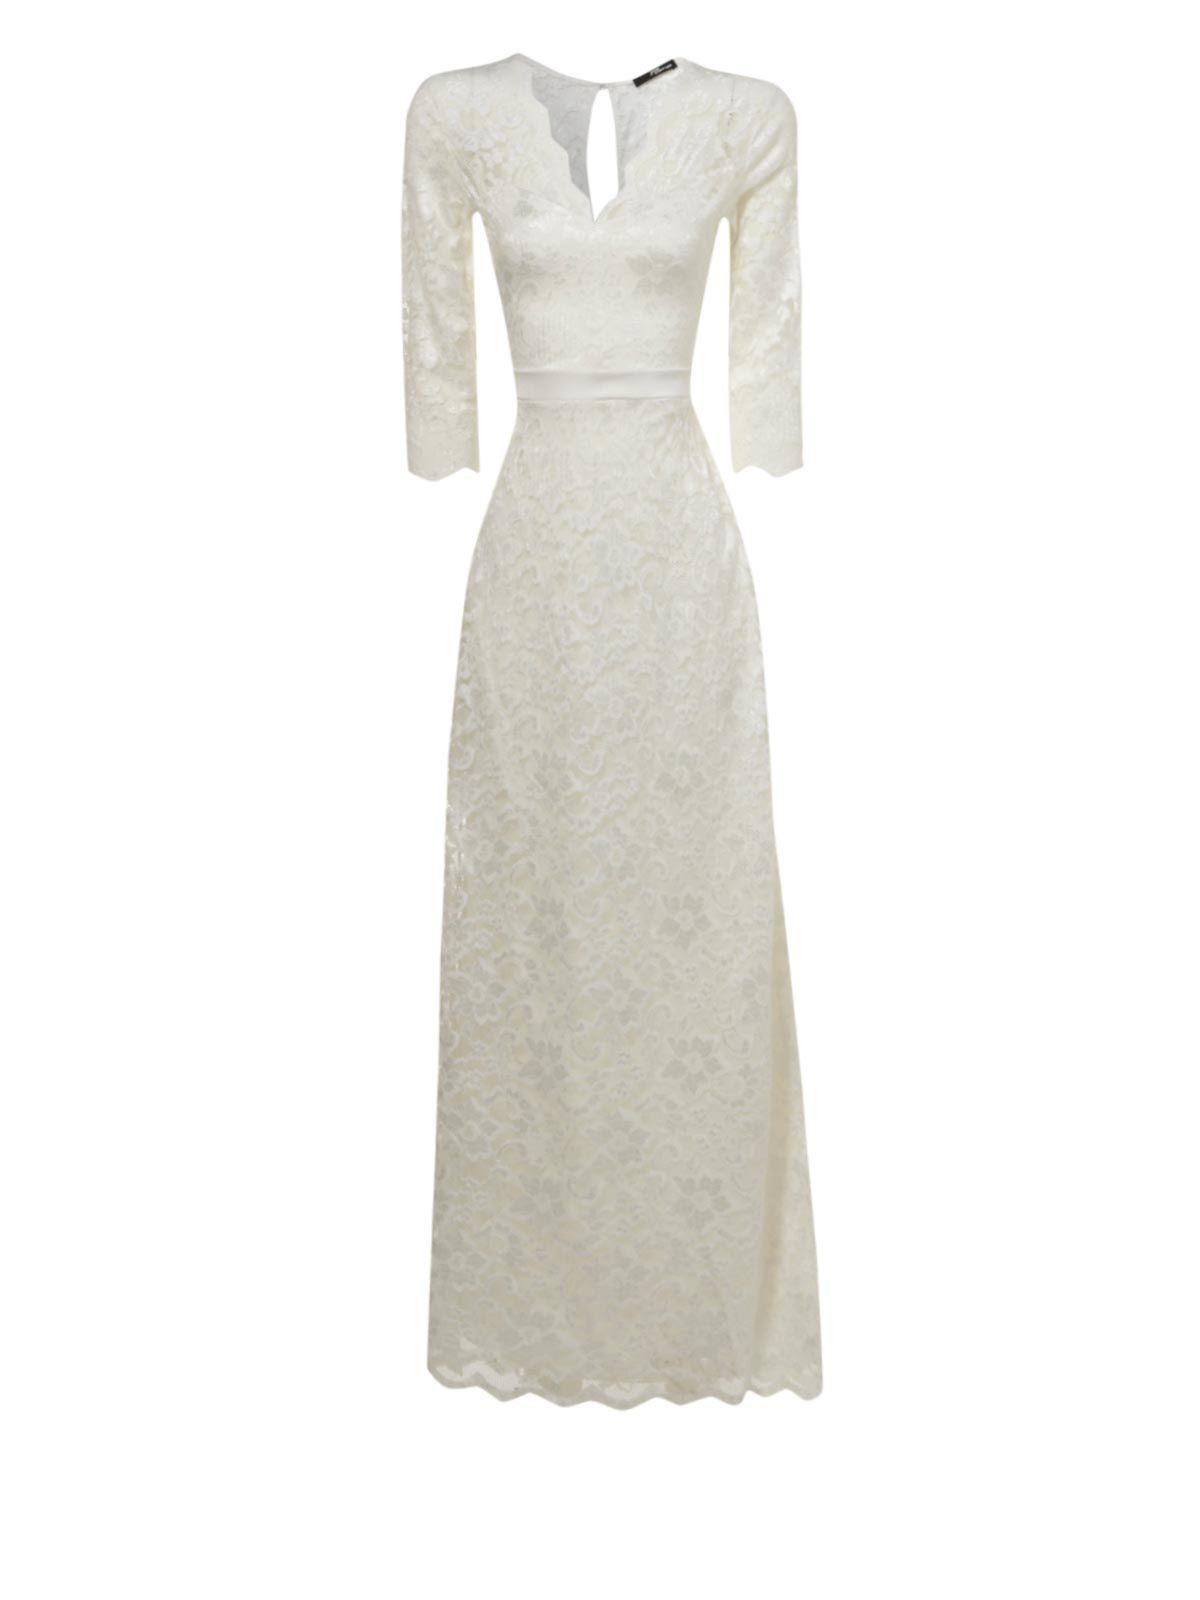 Lace Maxi Dress Jane Norman White Version Dresses Maxi Dress Lace Maxi Dress